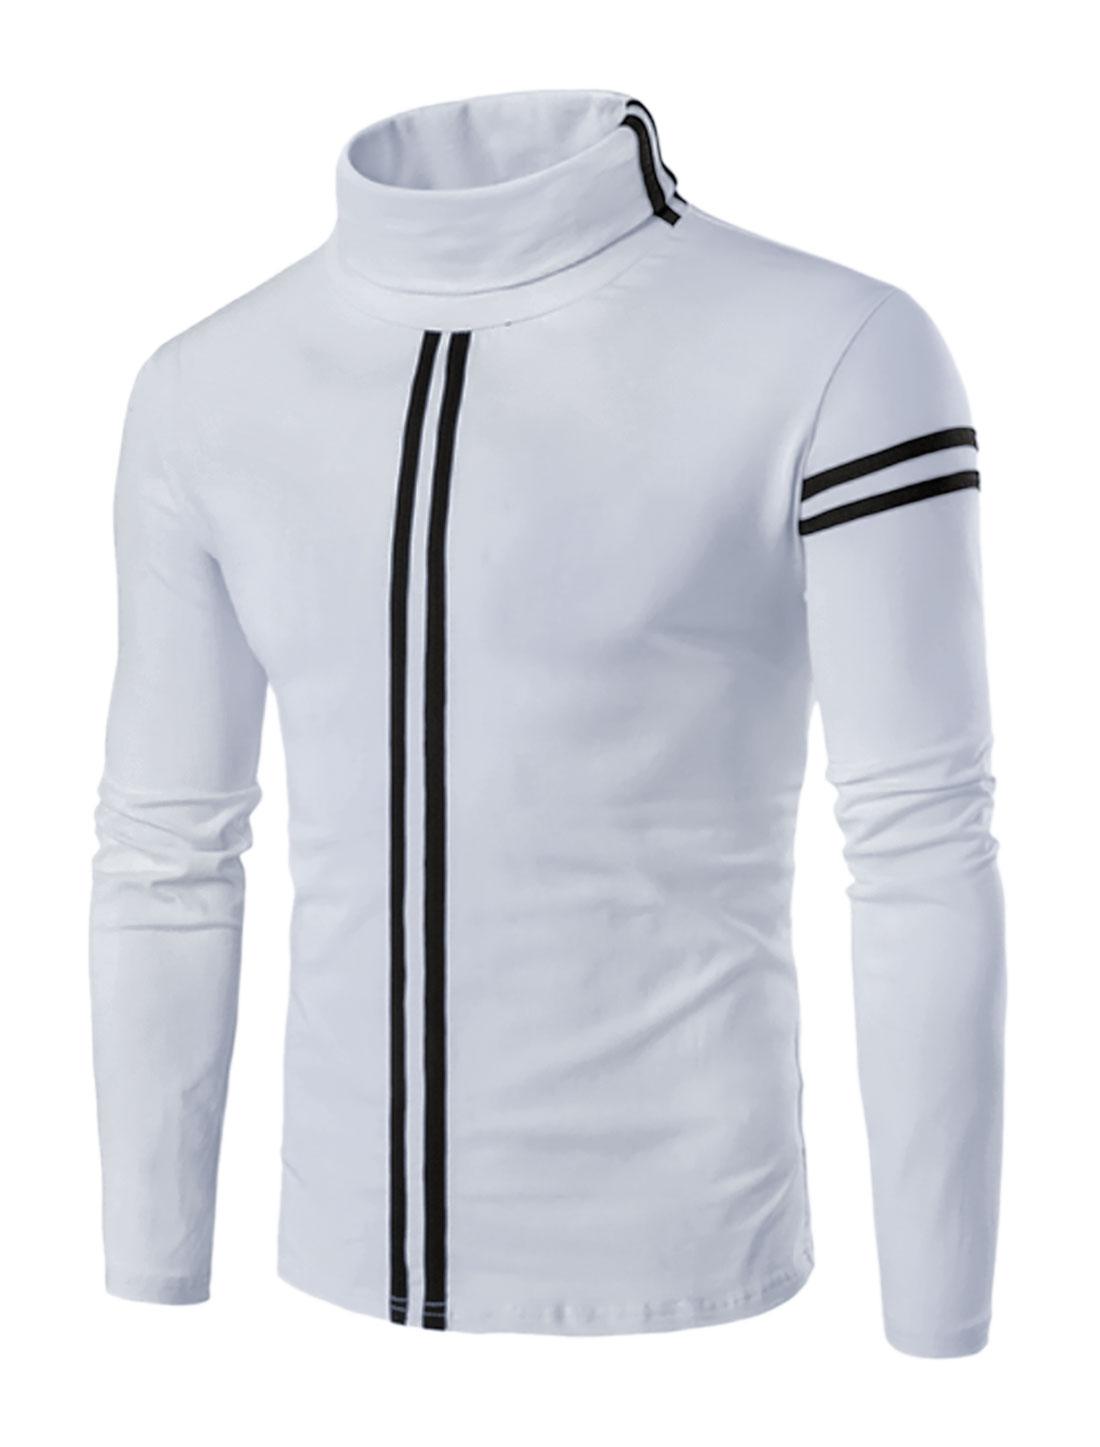 Men Turtle Neck Long Sleeves Stripes Slim Fit T-shirt White M